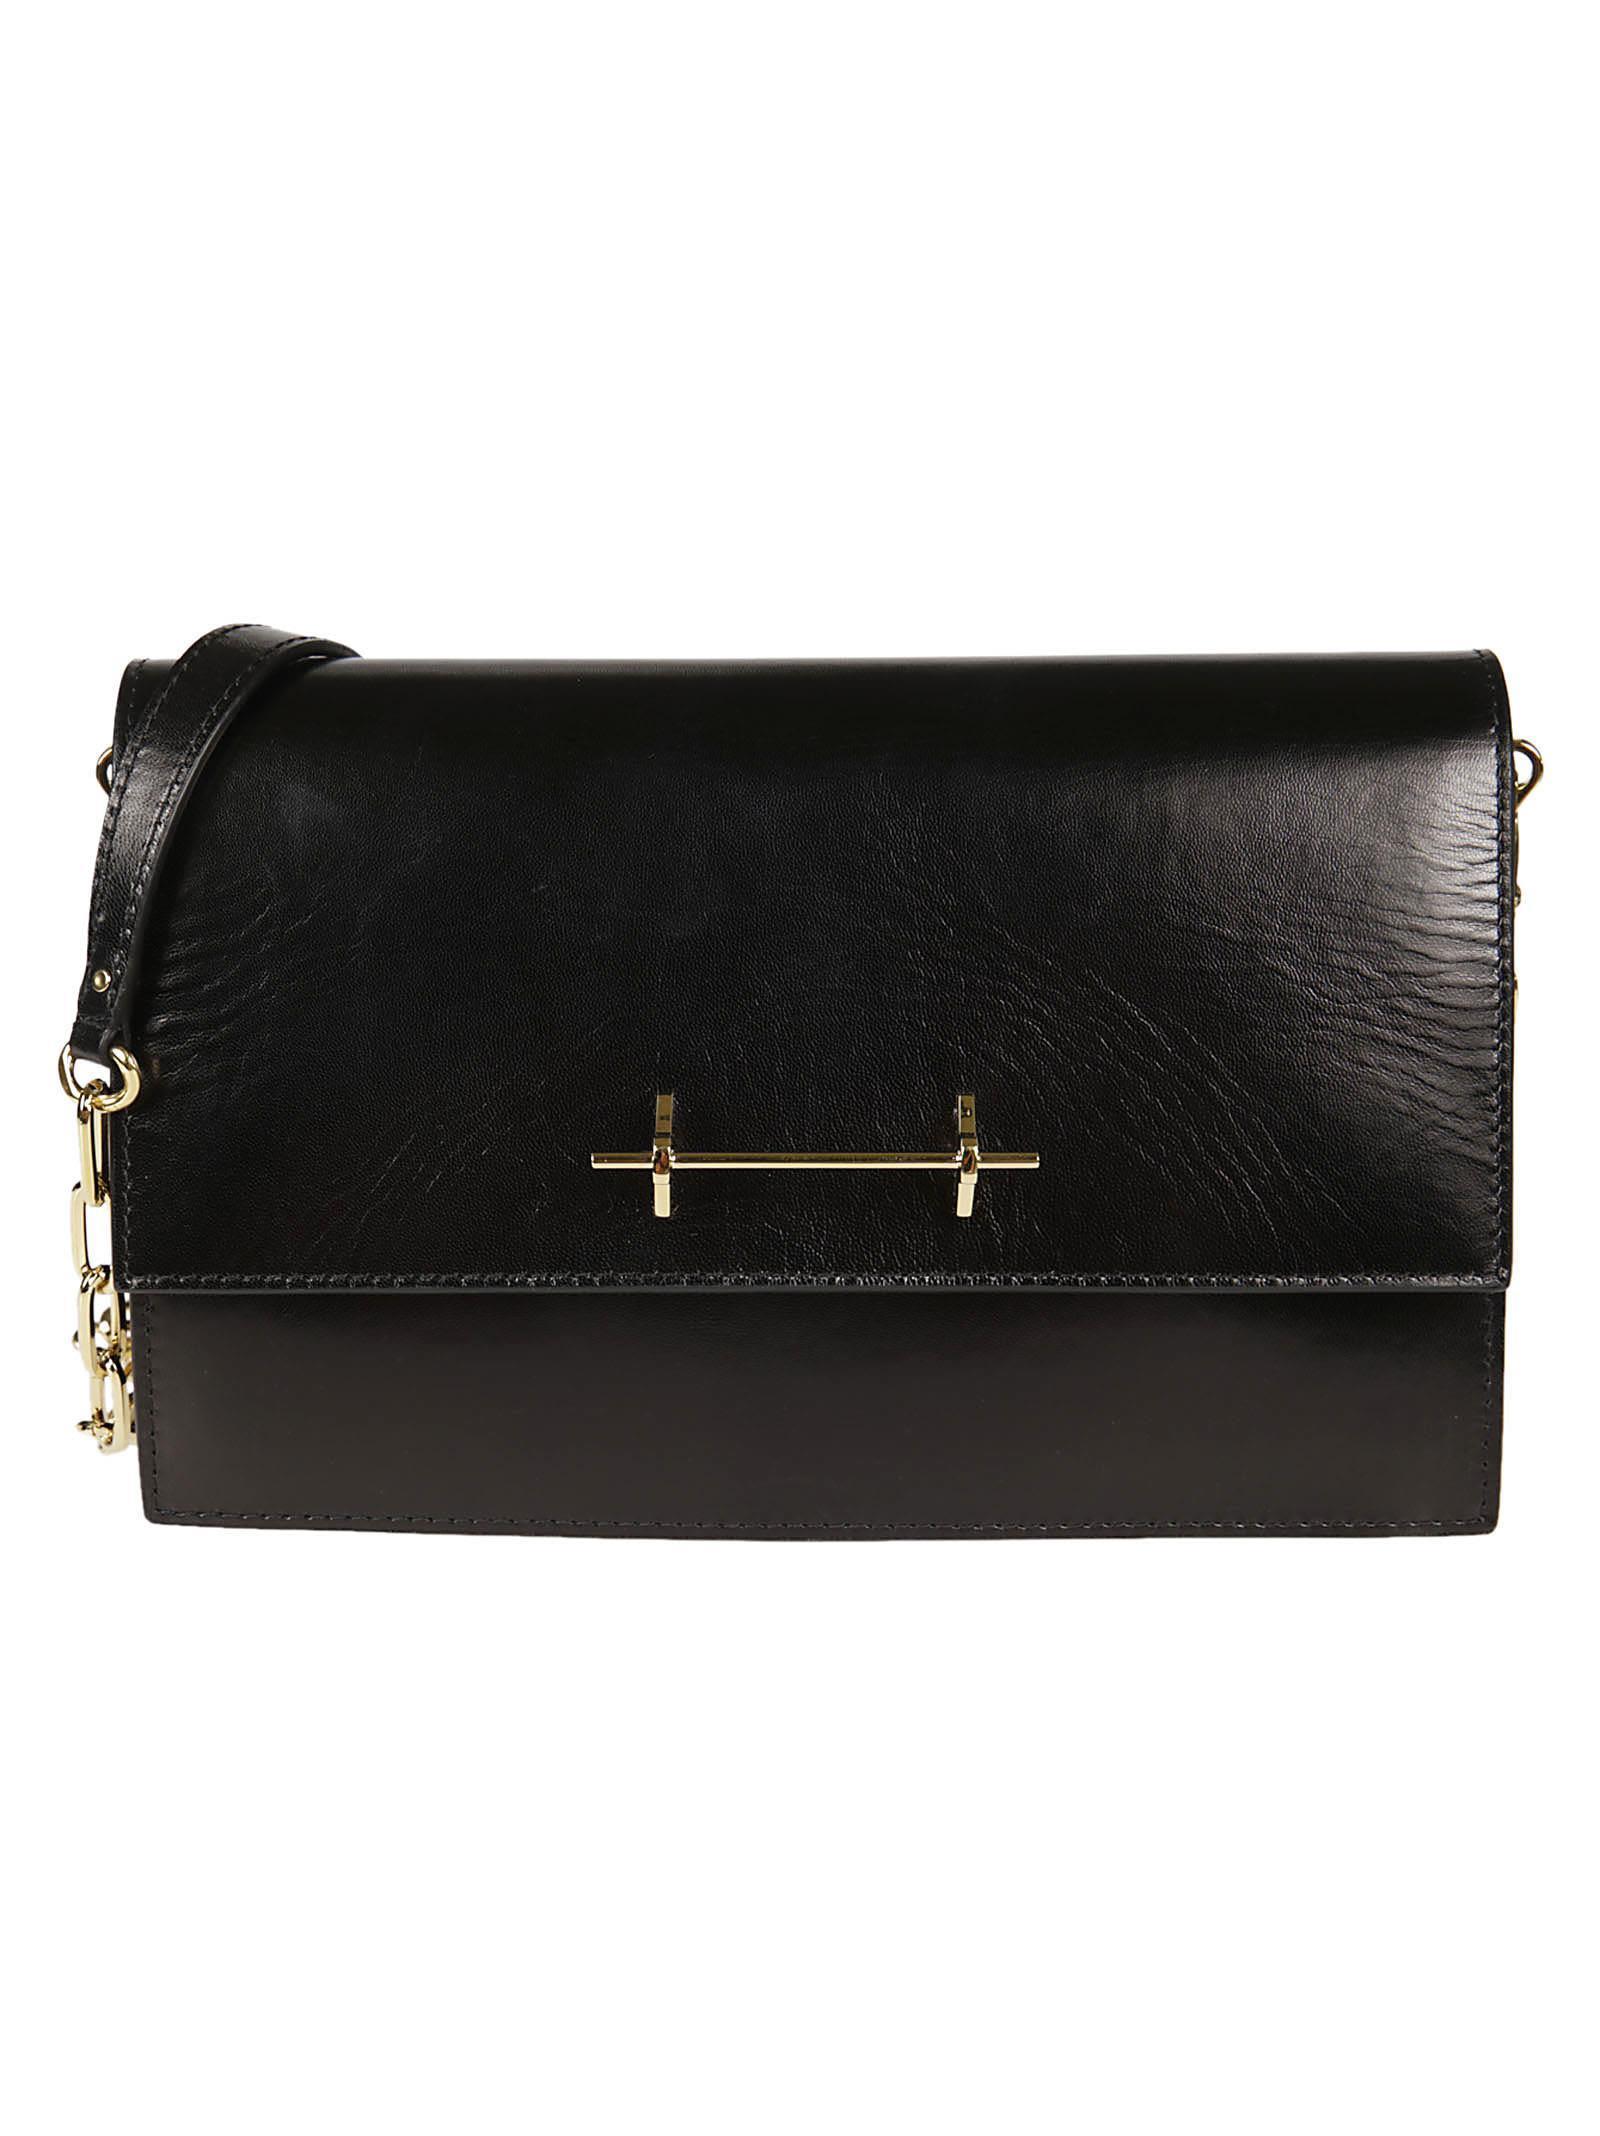 Jack Russell Malletier M2malletier Glossy Shoulder Bag